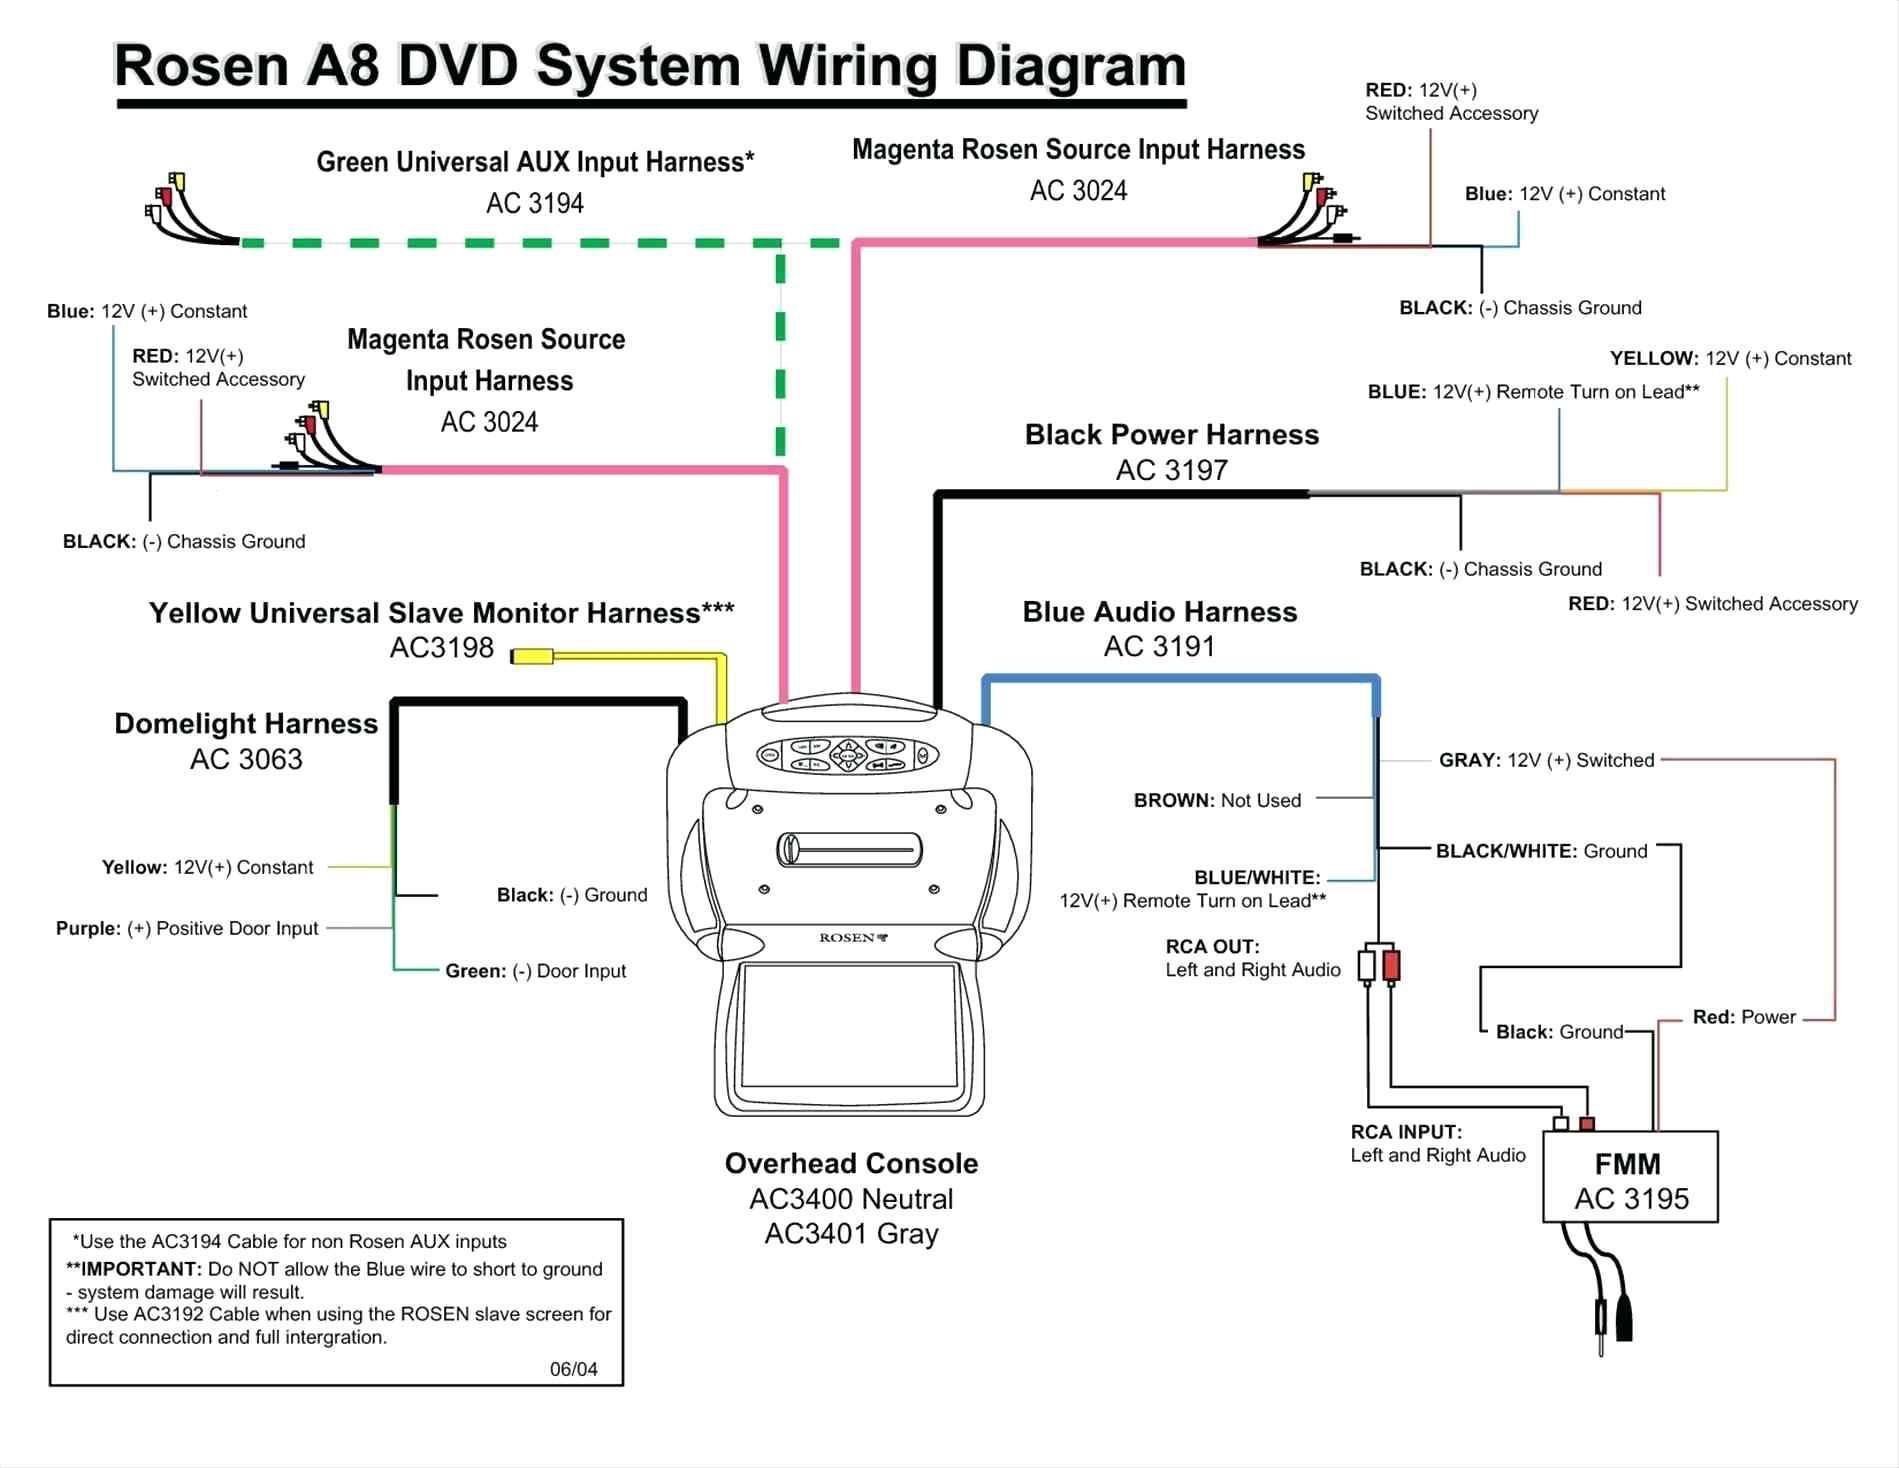 square d buck boost transformer wiring diagram Download-Wiring Diagram Detail Name square d buck boost transformer wiring diagram – Buck Boost Transformer 9-n